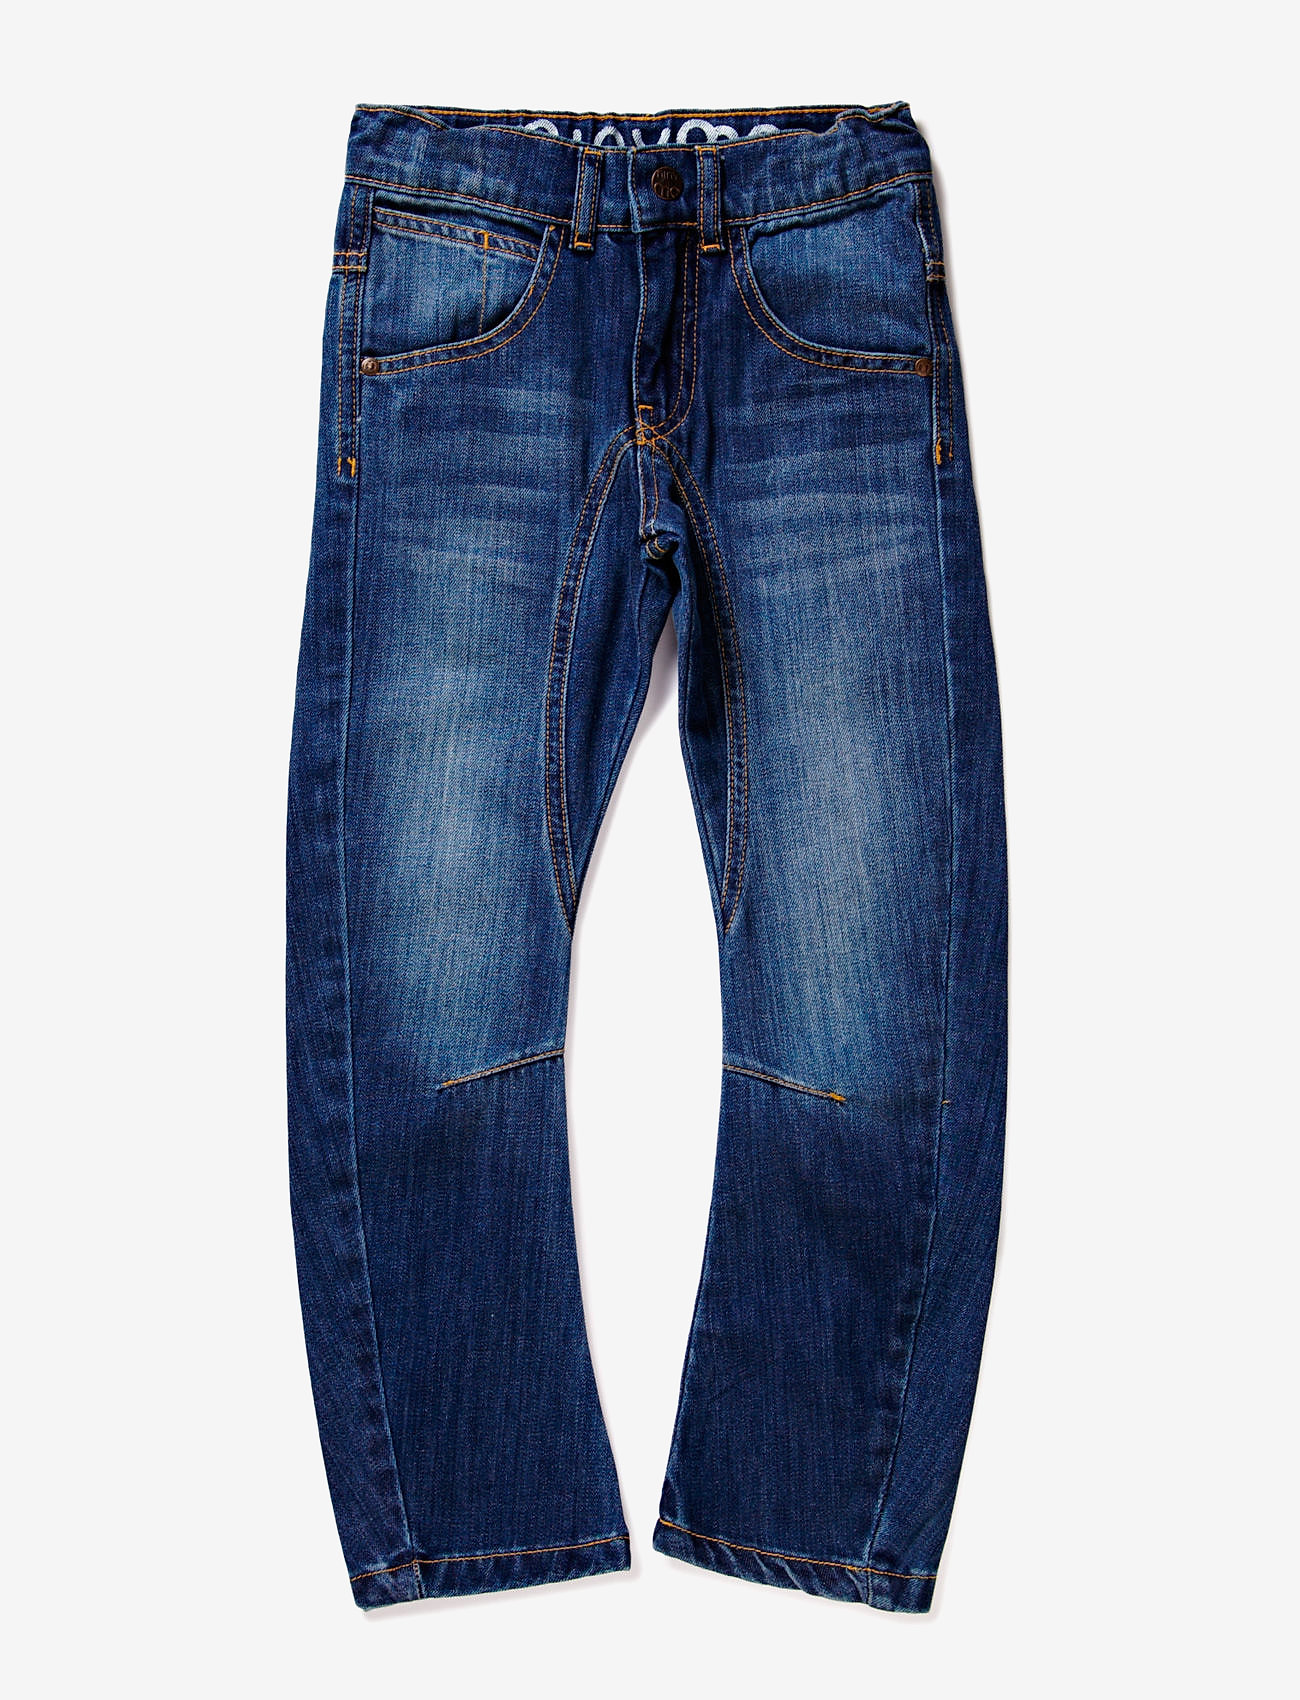 Minymo - Jeans boy - Engineer fit - jeans - denim - 0